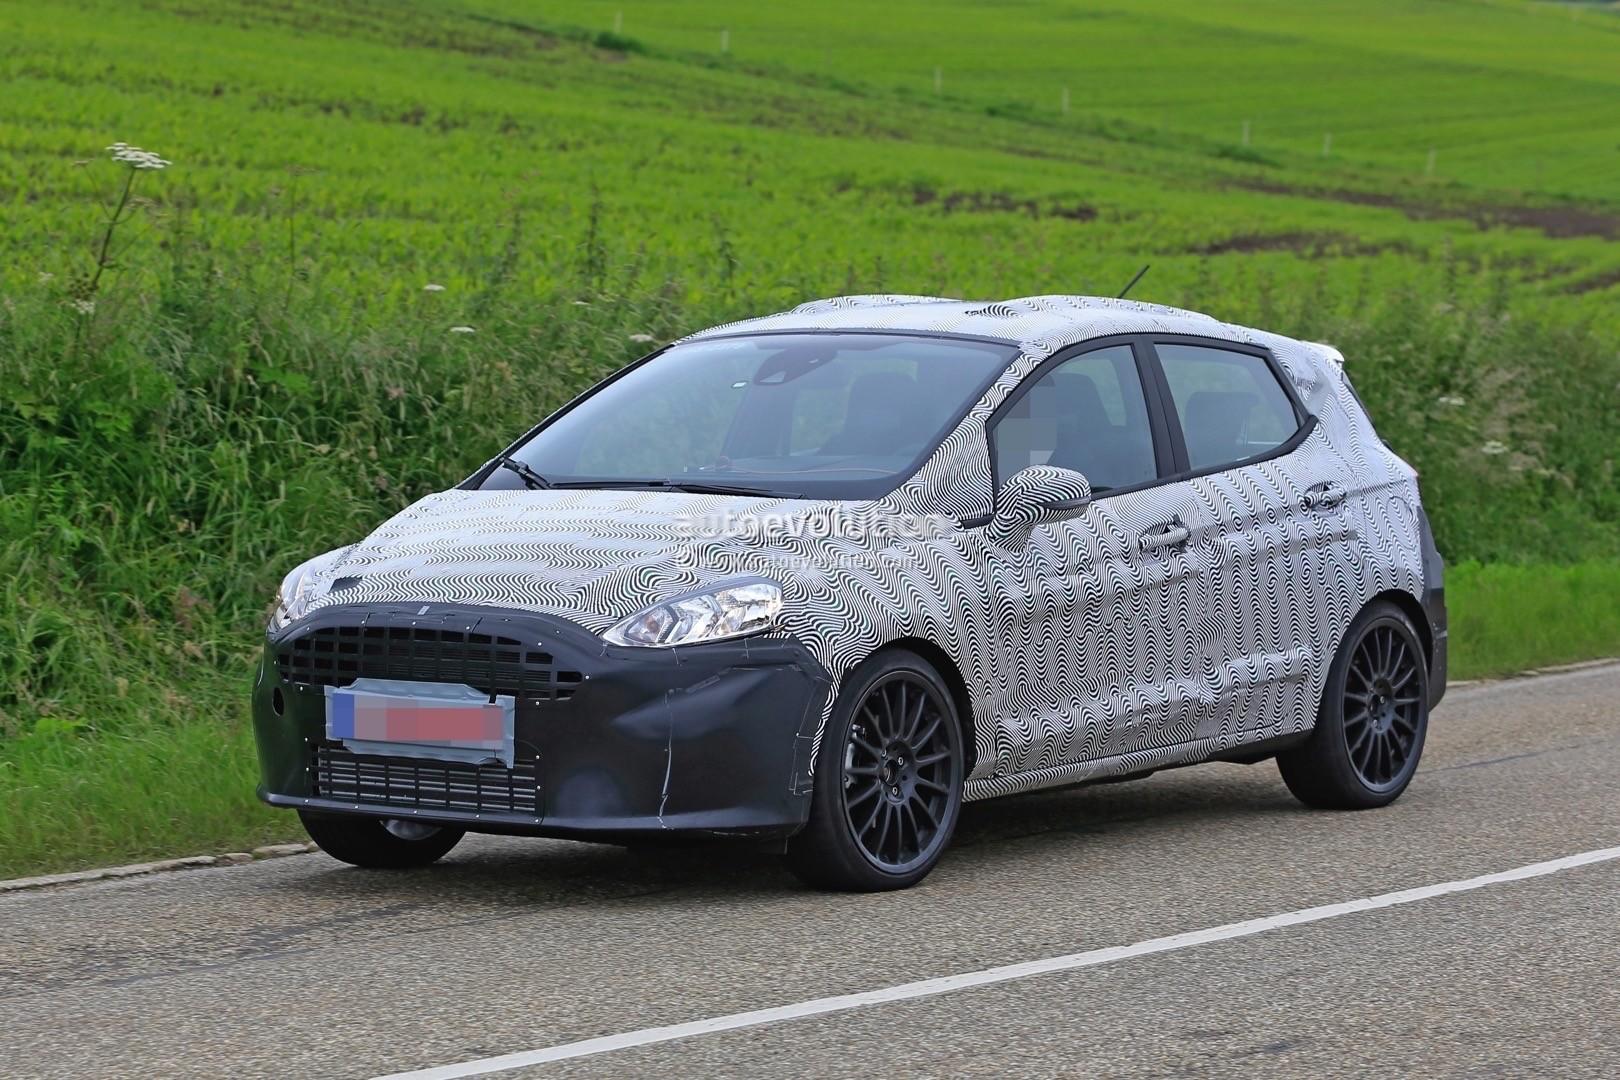 2018 Ford Fiesta St Spied Benchmarking Against Current Fiesta St